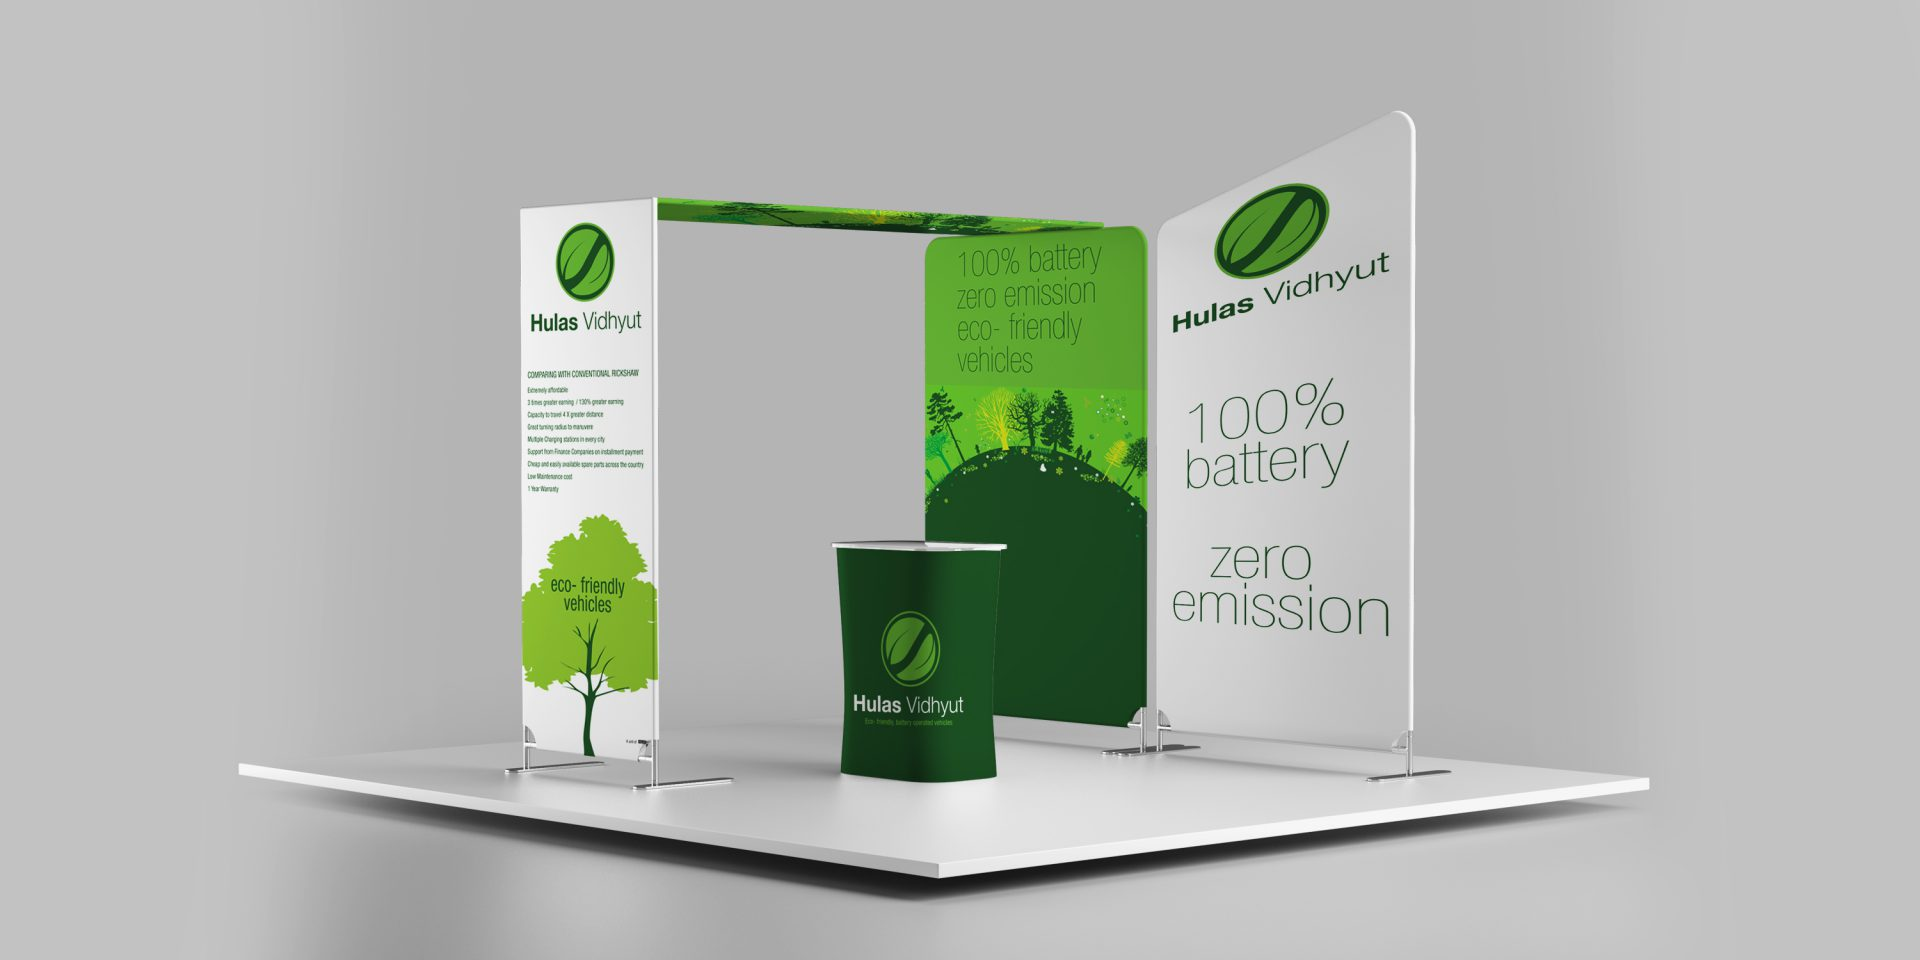 Hulas Vidhyut E-rikshaw Exhibition Stall Design